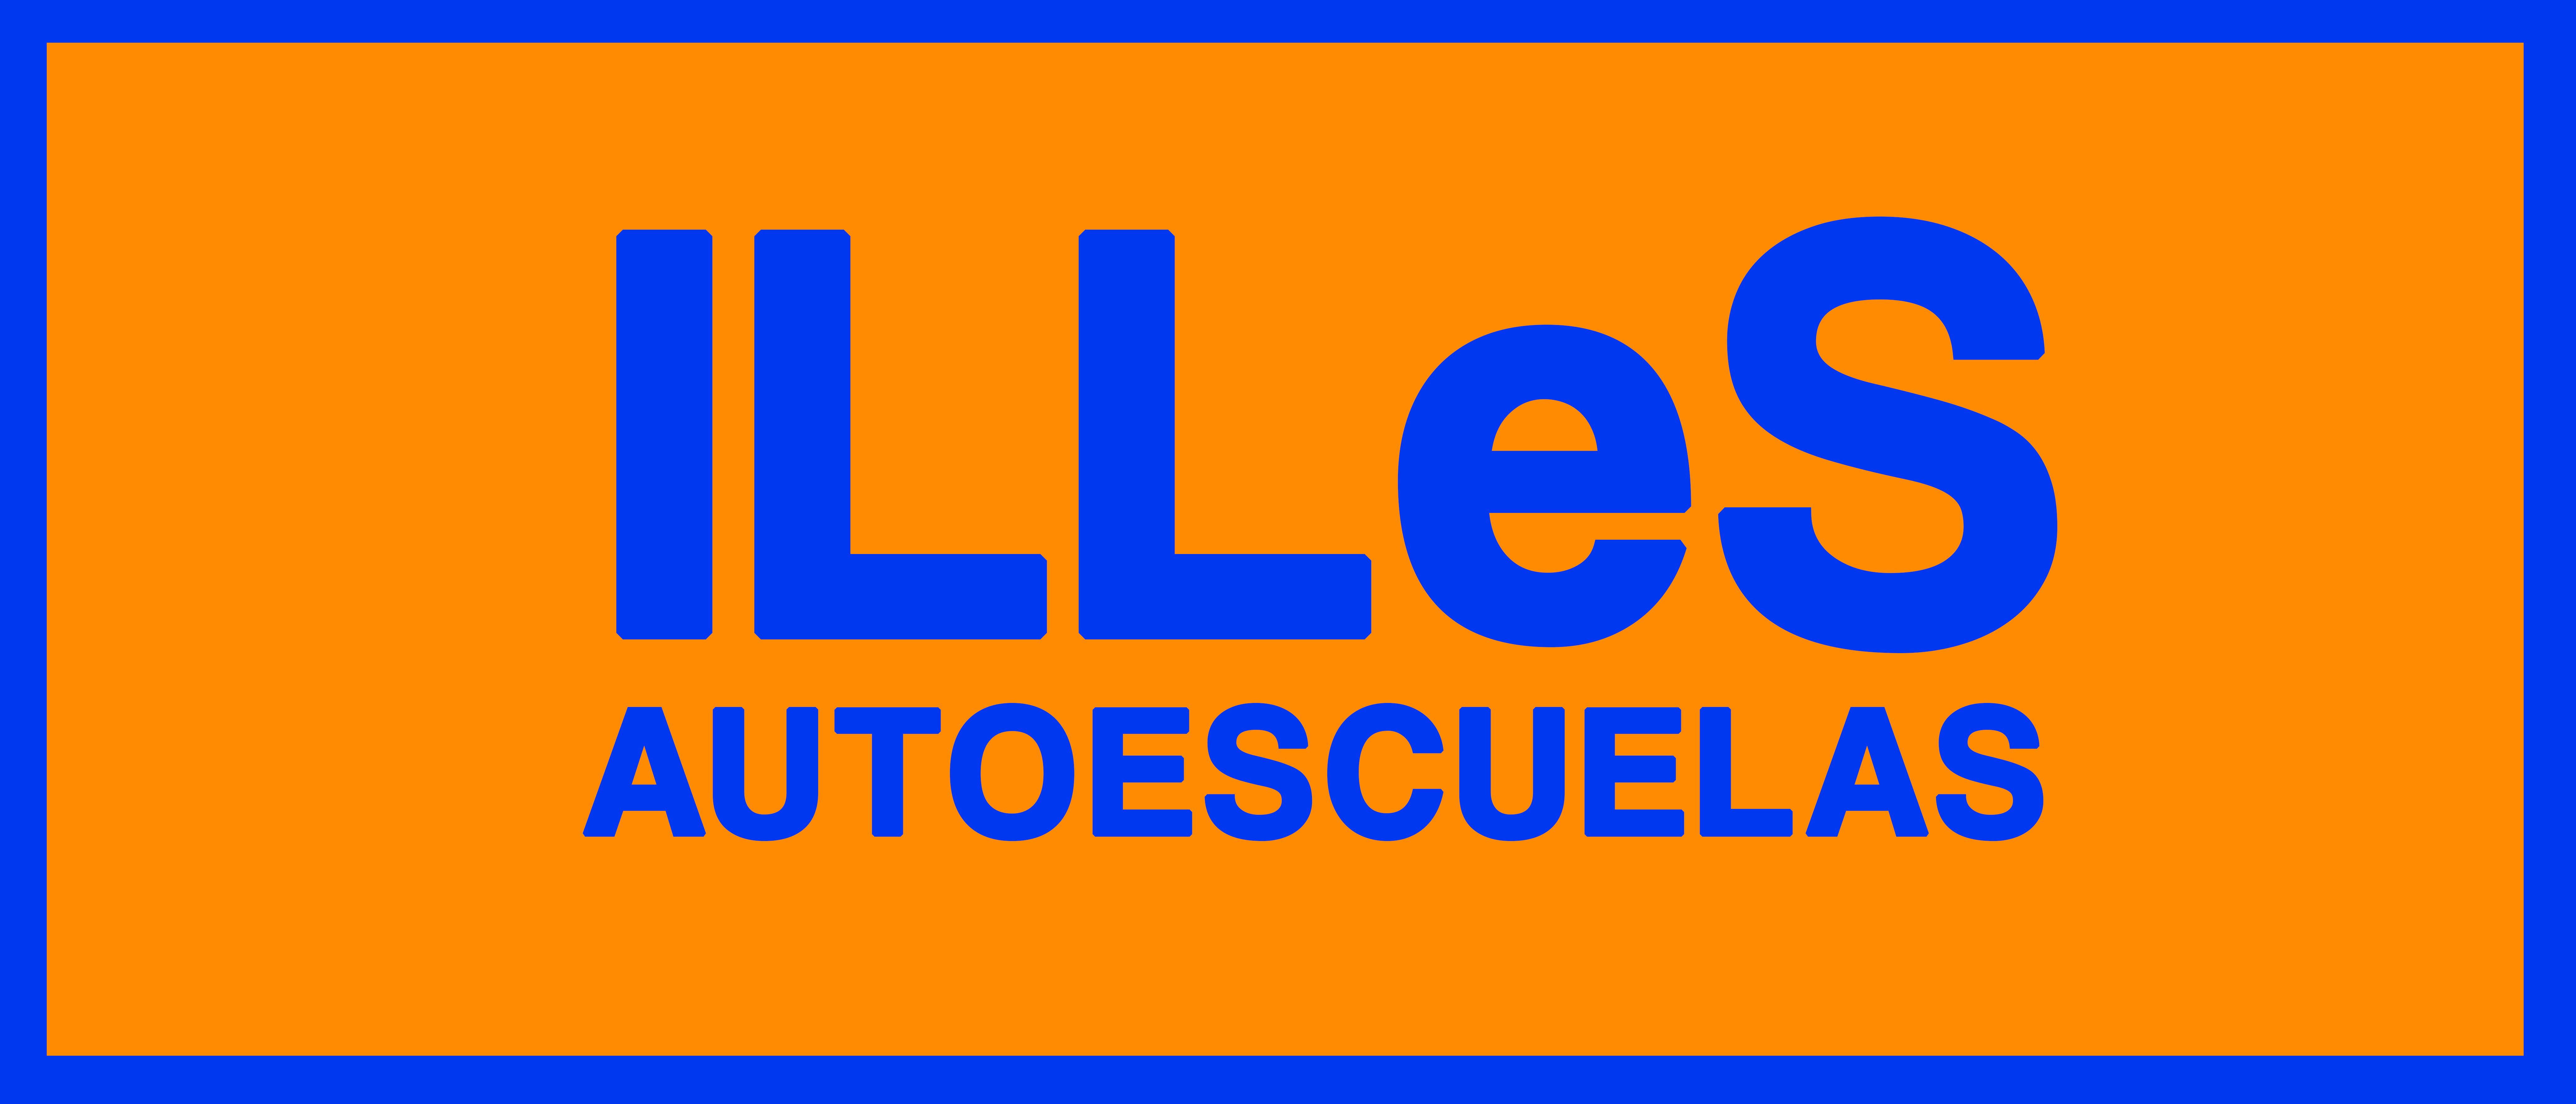 Autoescuela Illes